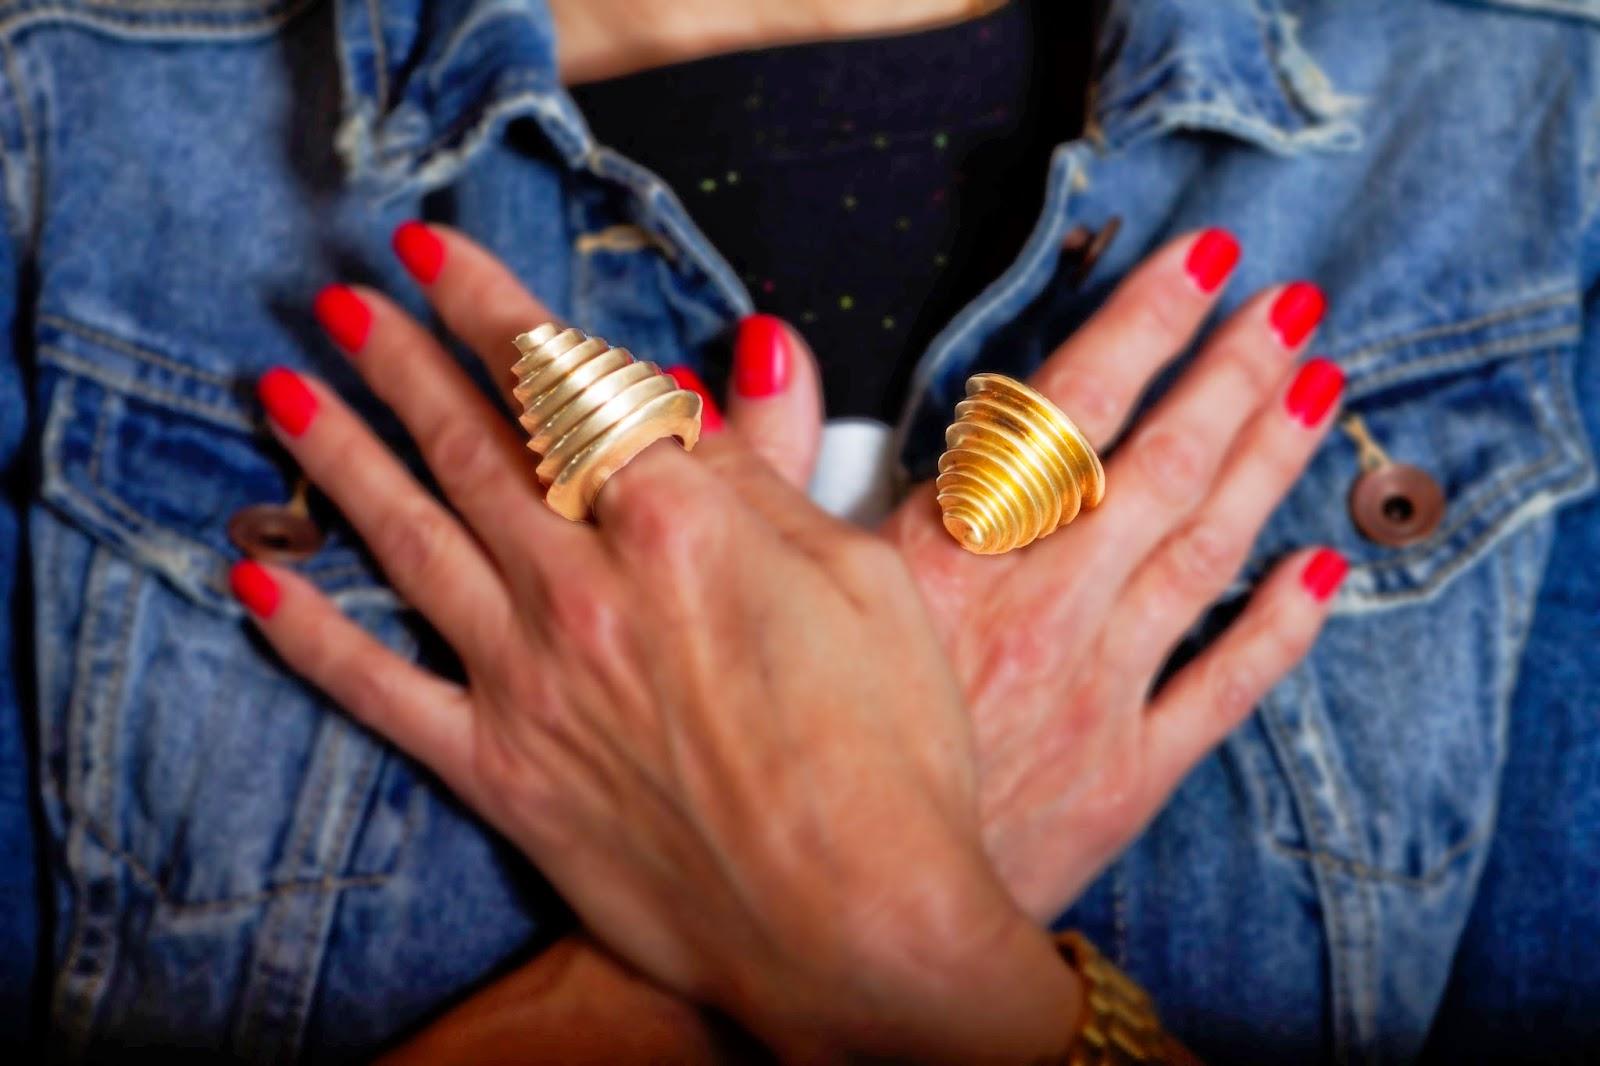 Adolfo Barnatan, joyería, oro, escultura, arte, moda, complementos, Elena Benarroch, Carlos Tromper, Fashion blogger, Fashion Style, Carmen Hummer